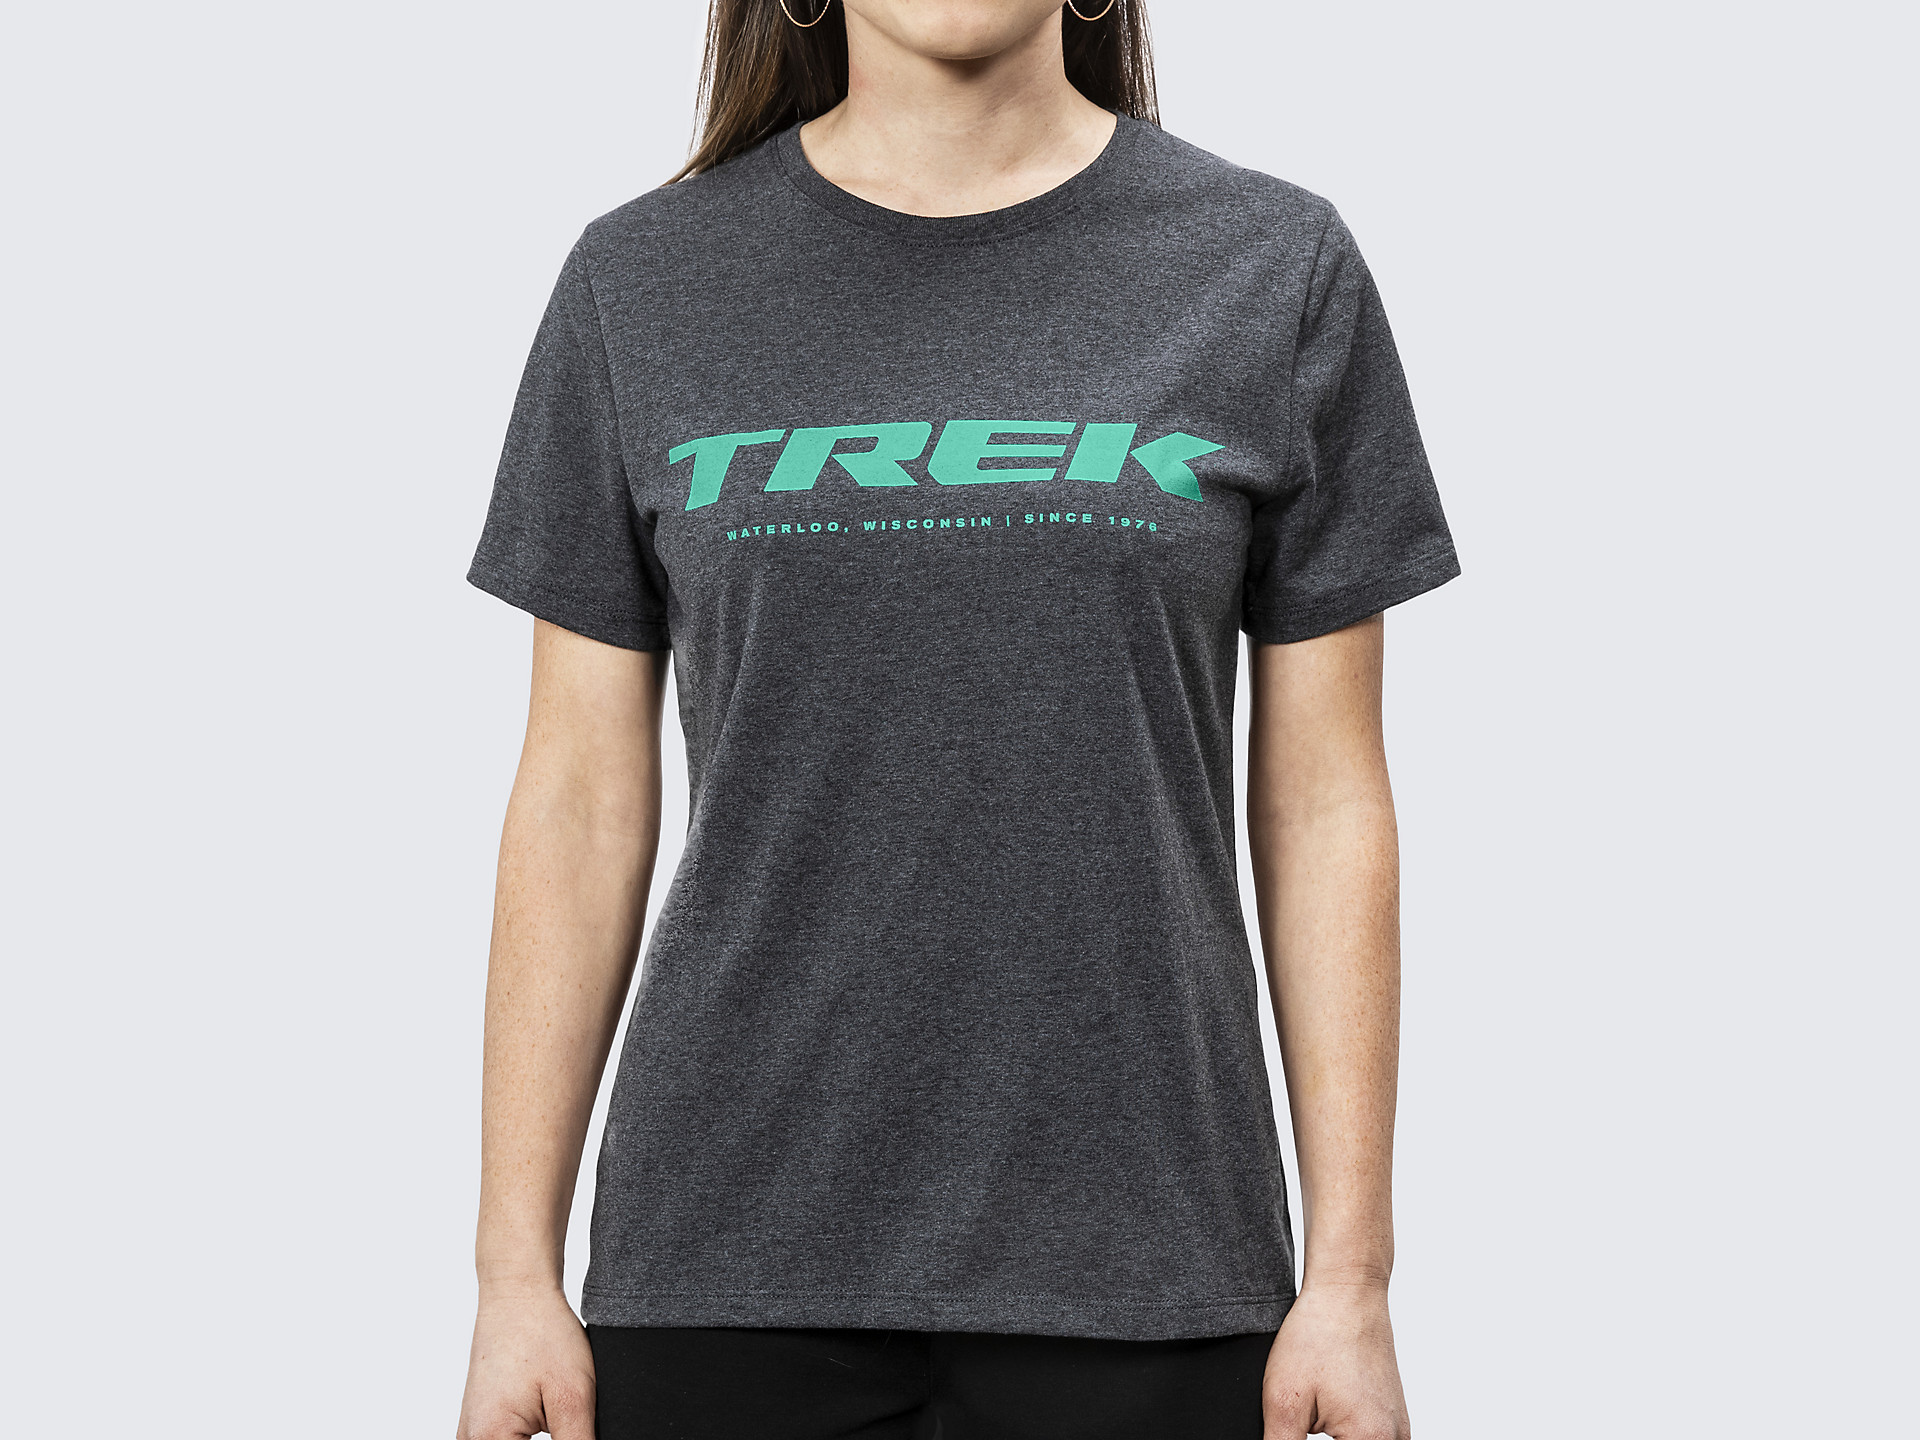 b58feb20 Trek Logo Women's T-shirt